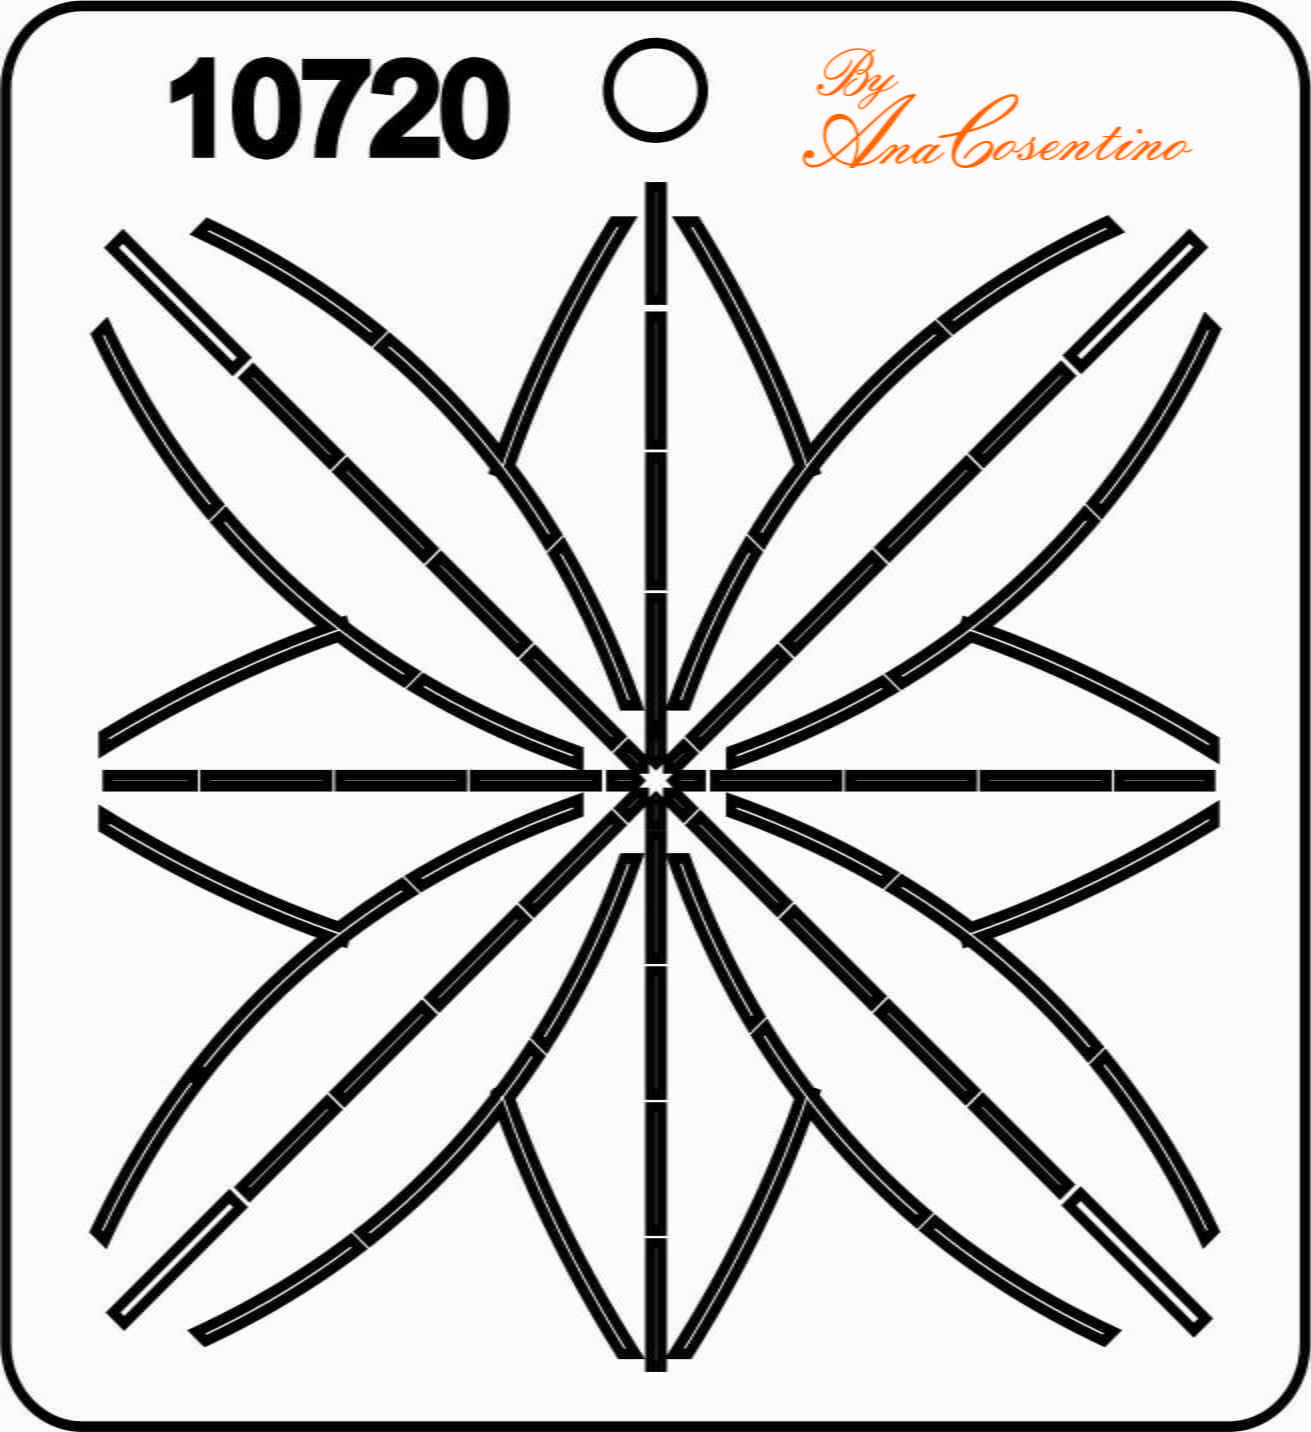 Estêncil de Quilting (Pequeno) - 10720